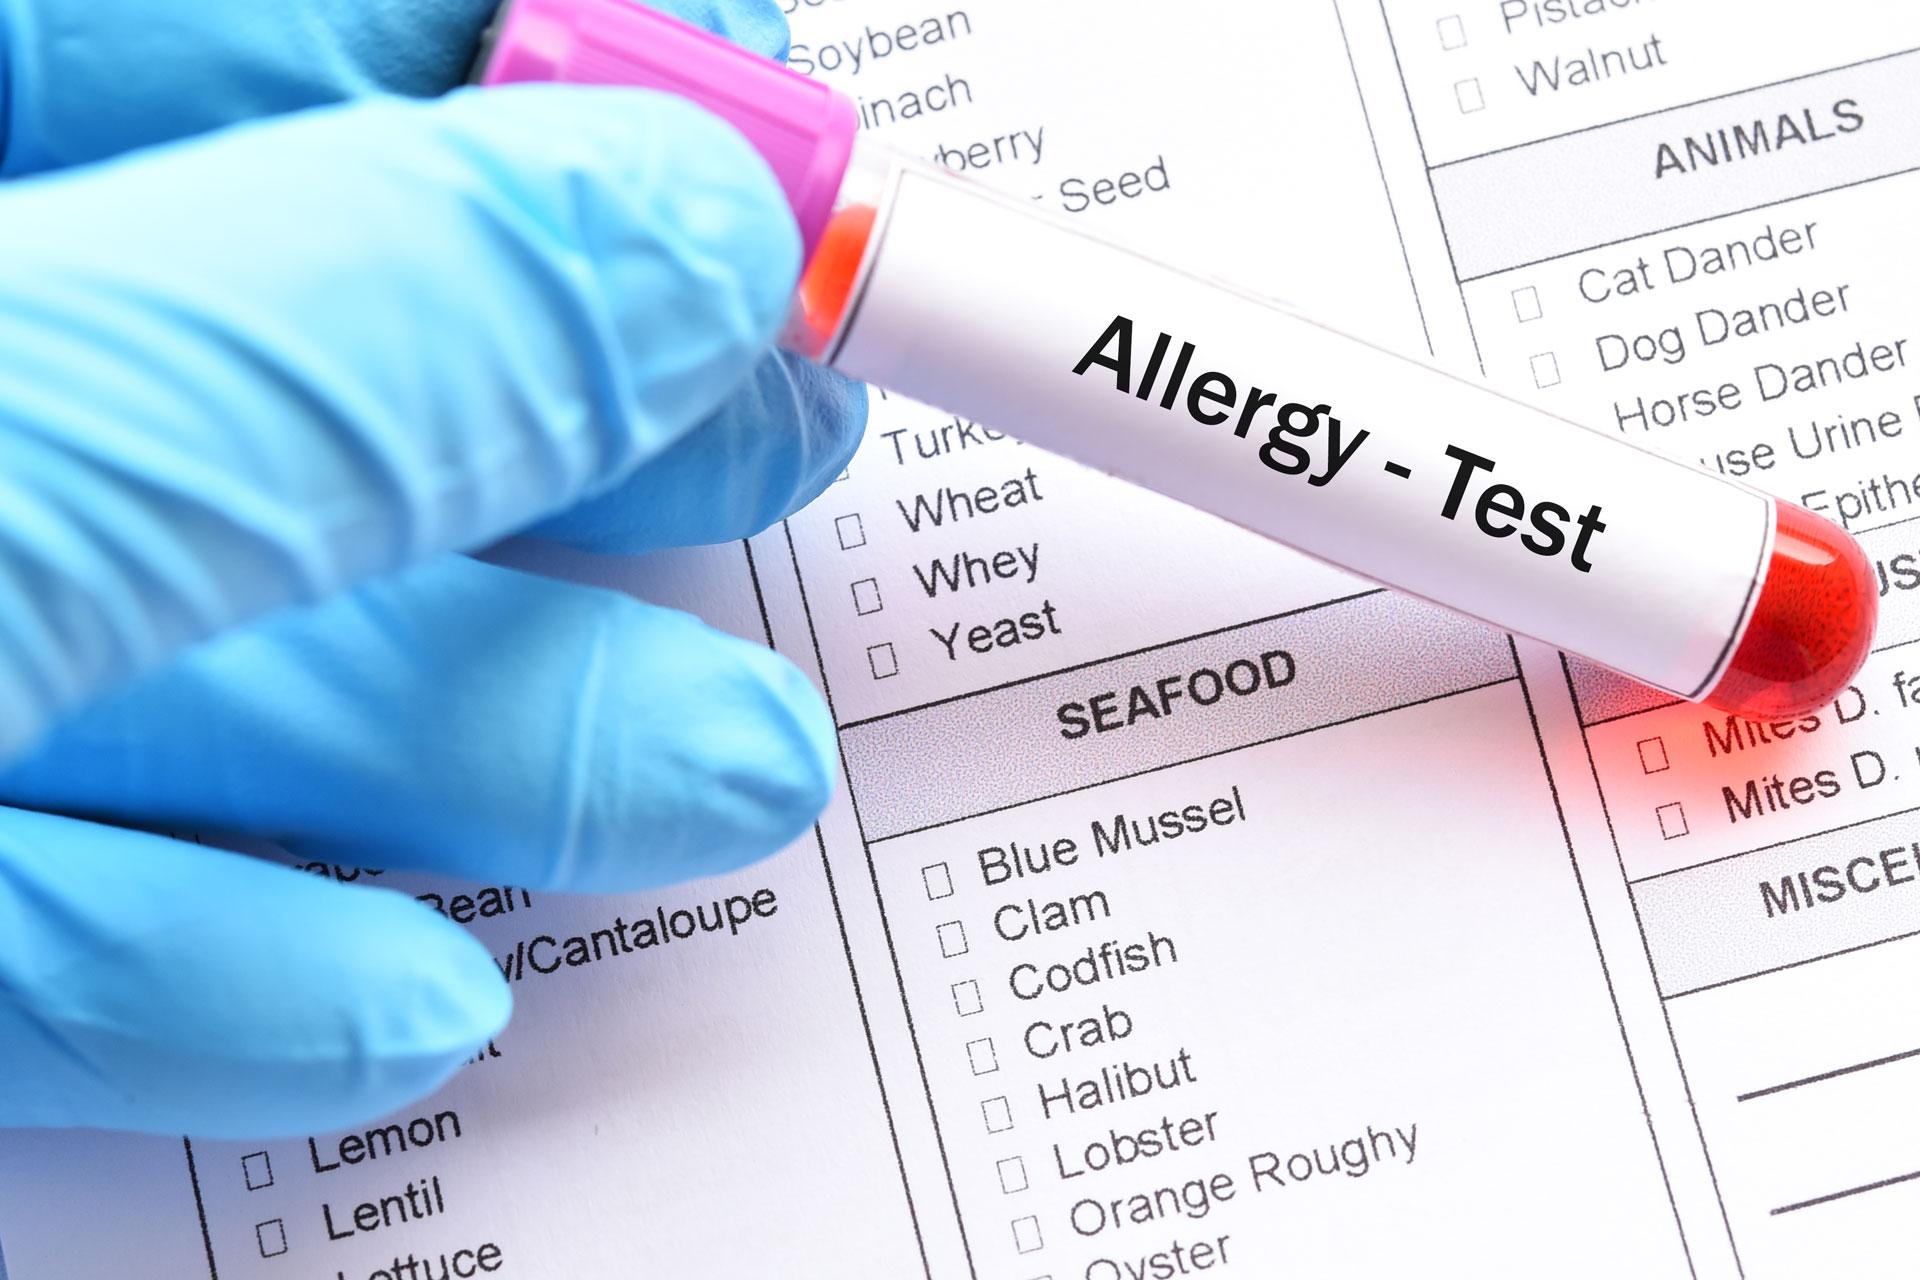 Kansas City Allergy & Asthma - Testing